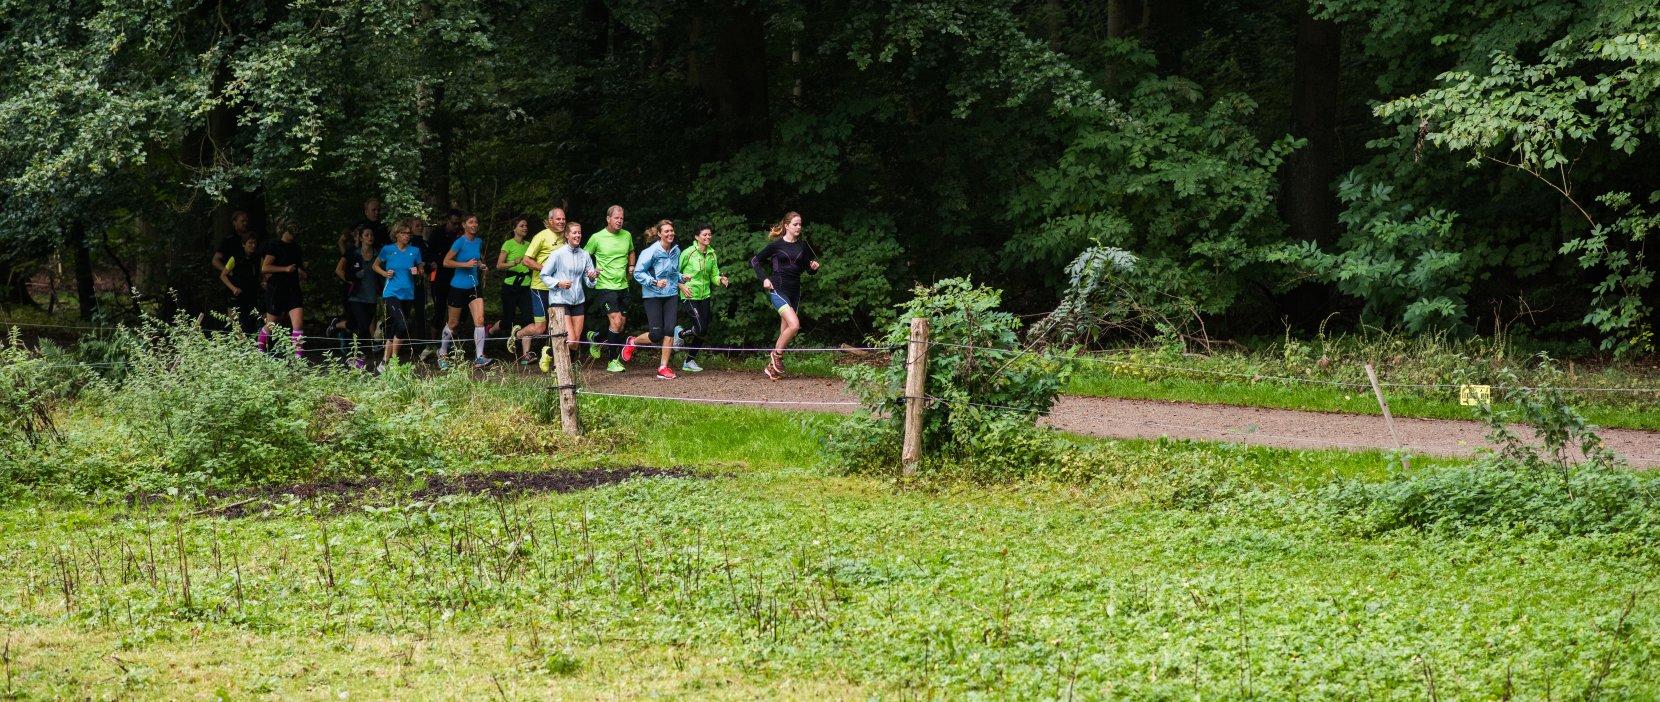 Foto: Løbere i skov